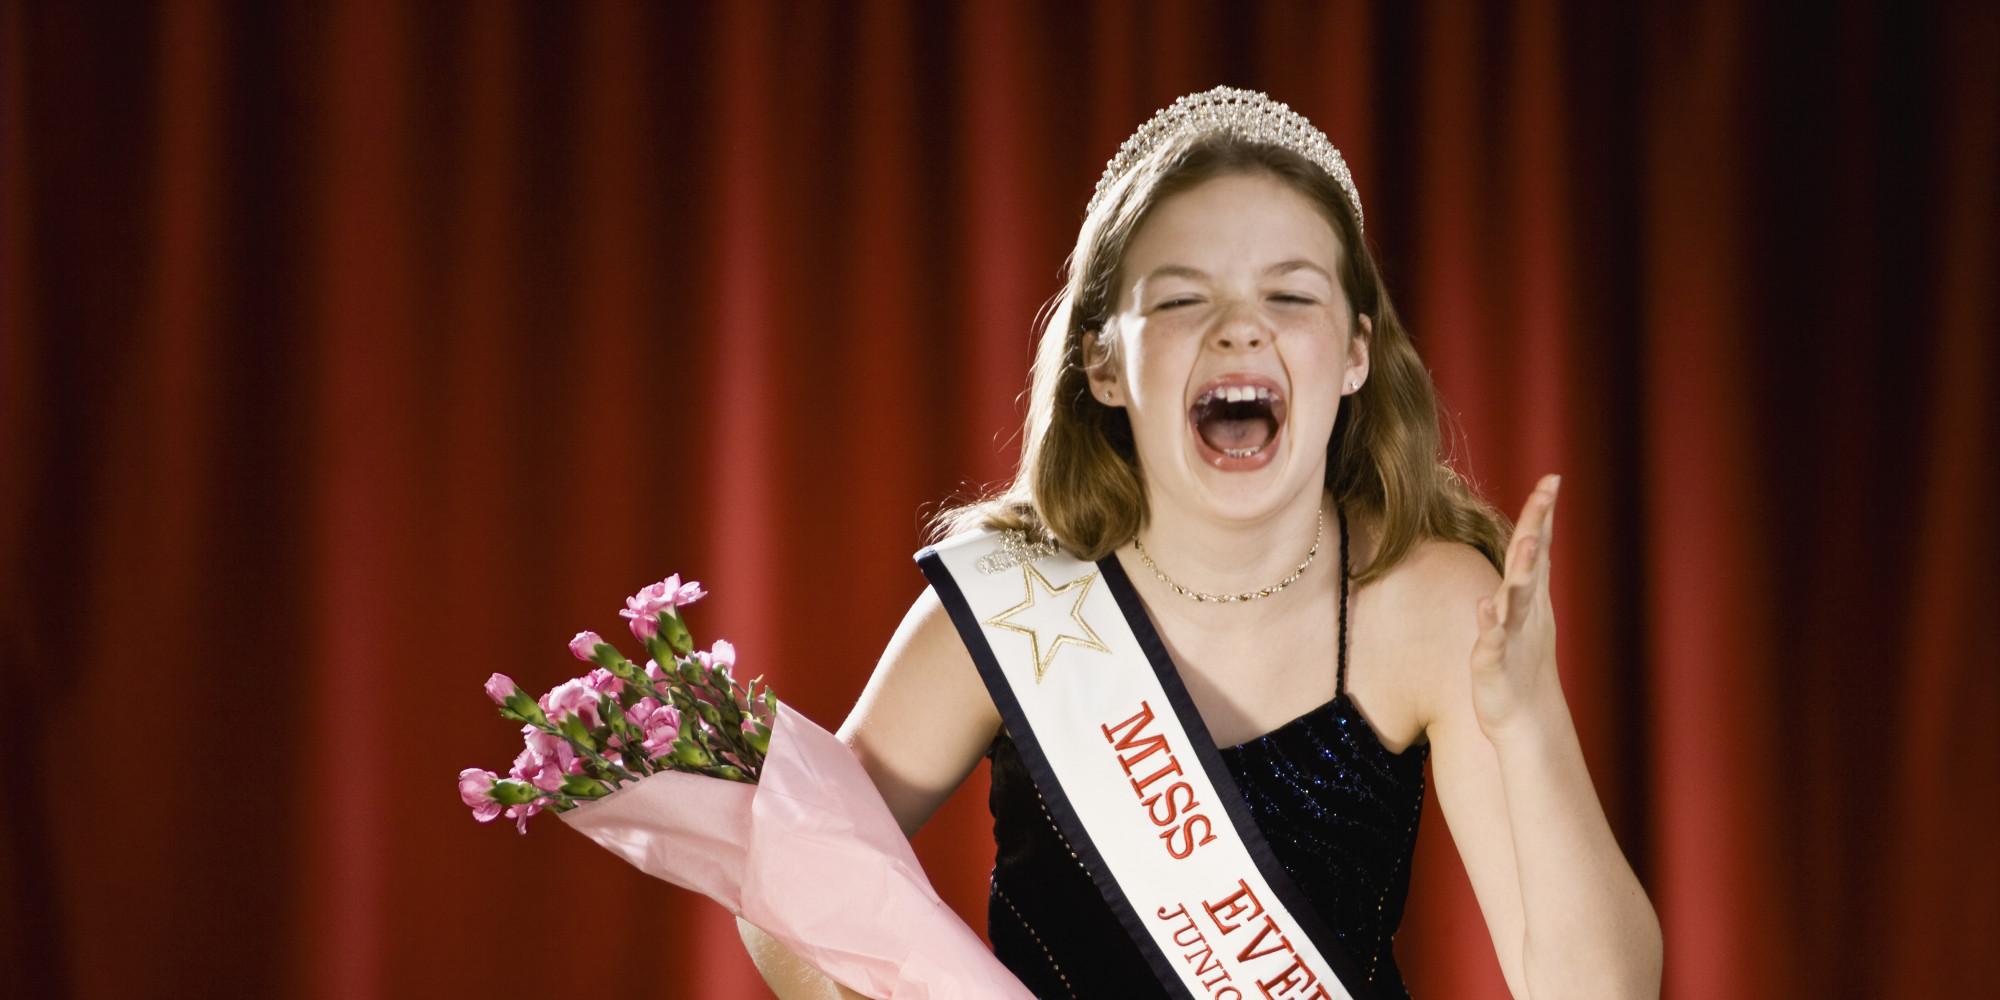 beauty world update review o child pageants facebook jpg 2000atilde1511000